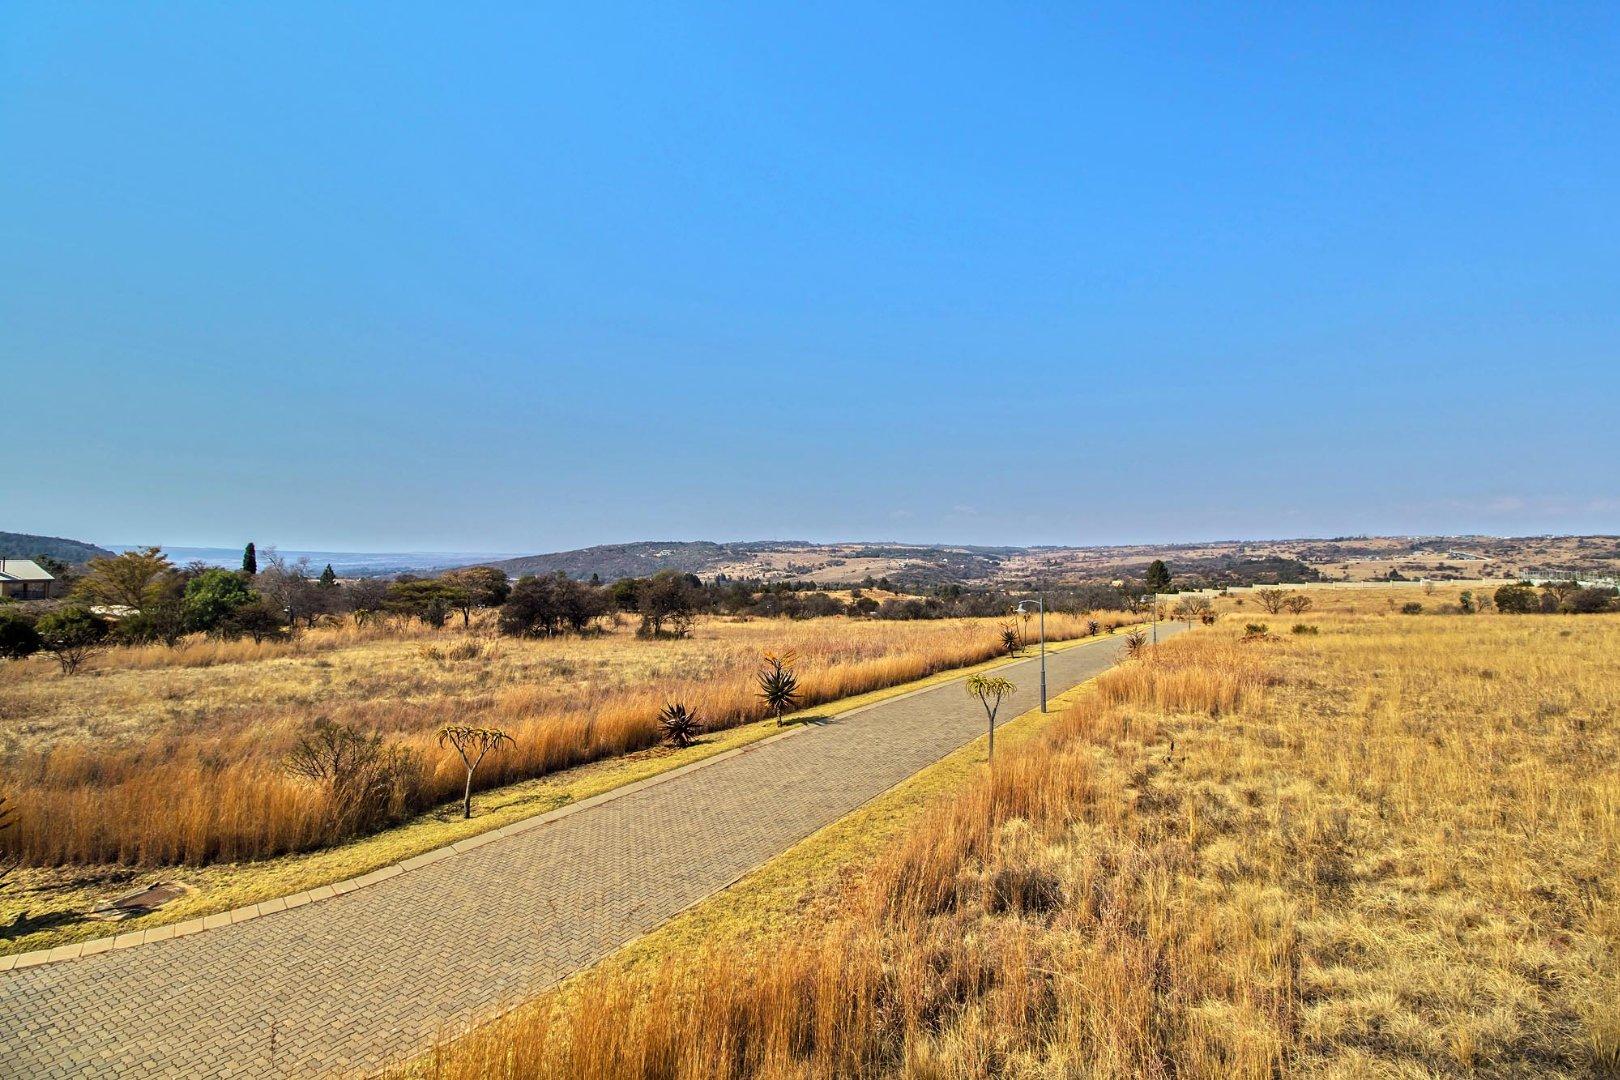 , Vacant Land - ZAR 1,725,000